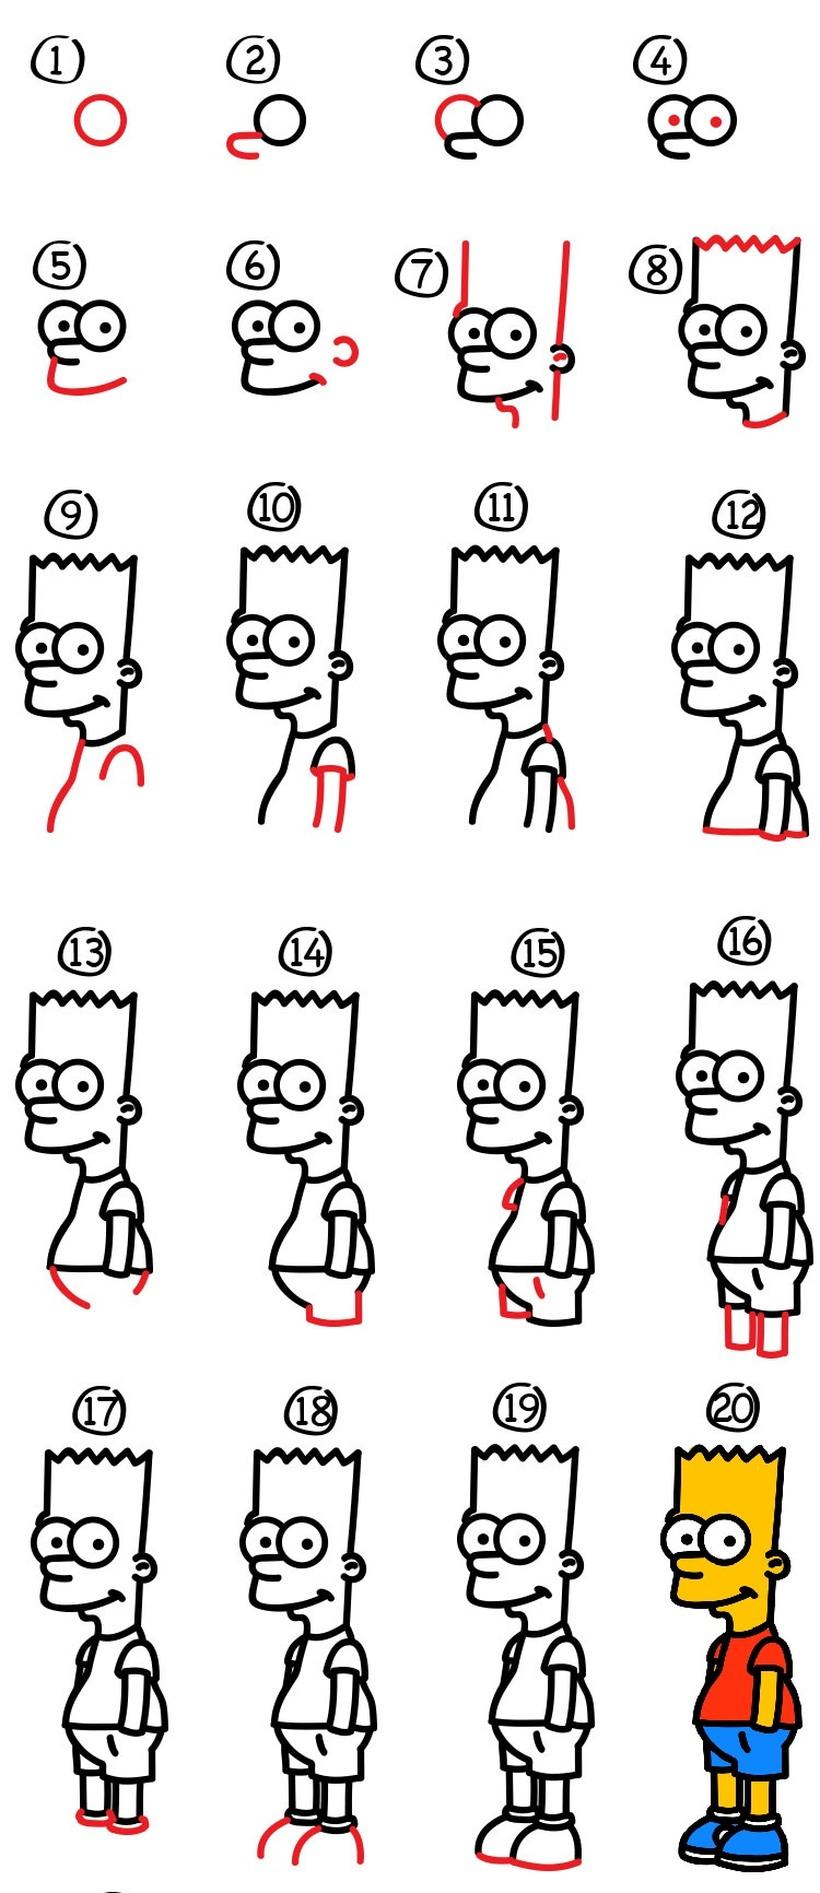 dibujos fáciles bart simpson paso a paso animados famosos dibujar este personaje cartoon